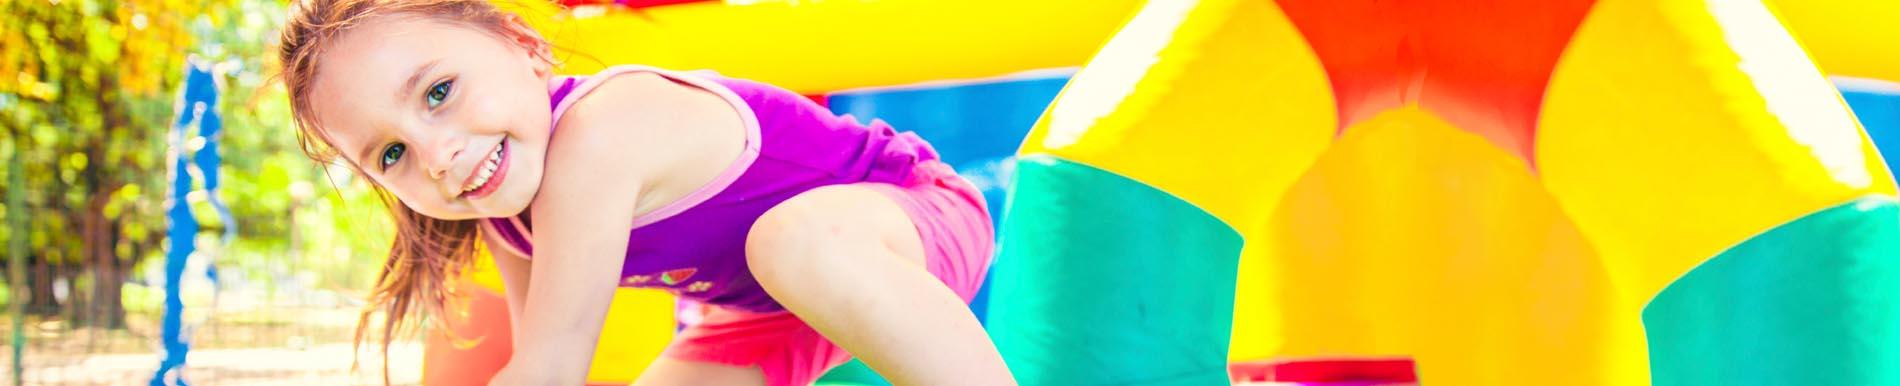 https://www.healthychildren.org/SiteCollectionImages/bouncehouse_girl_homepage.jpg